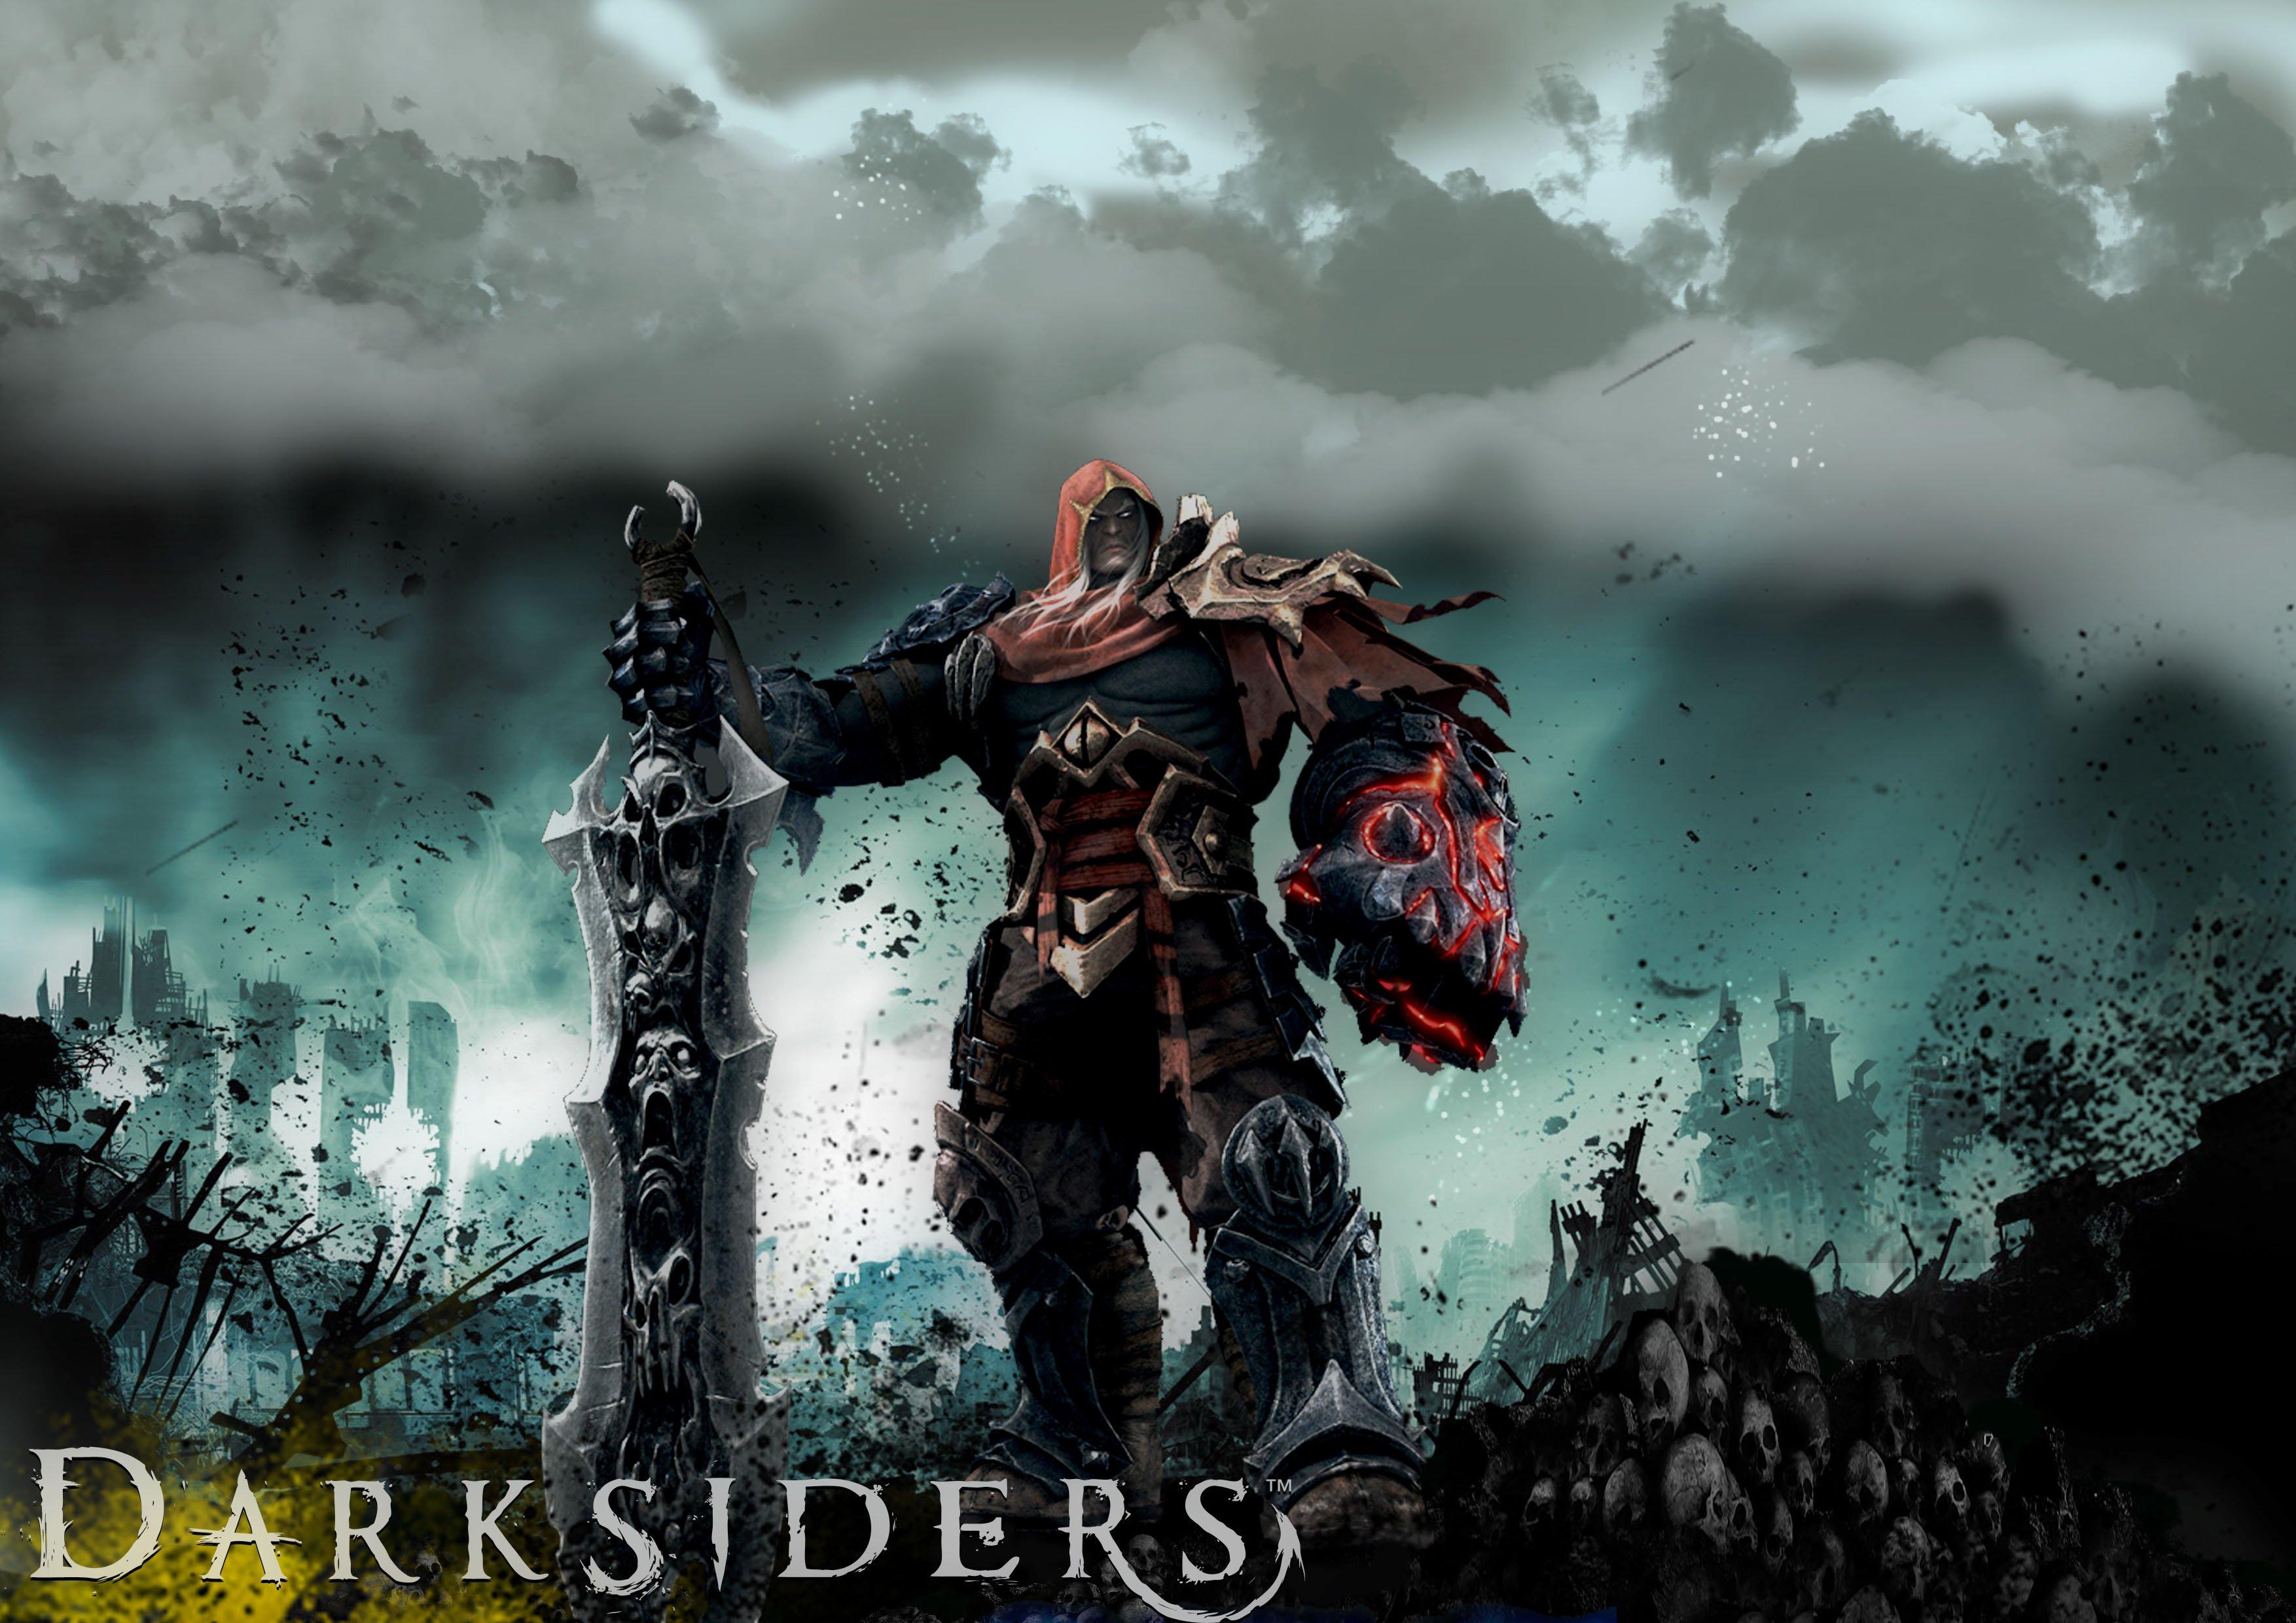 Vido Test Darksiders Wrath of War   helyalart   Le plaisir de 3508x2480